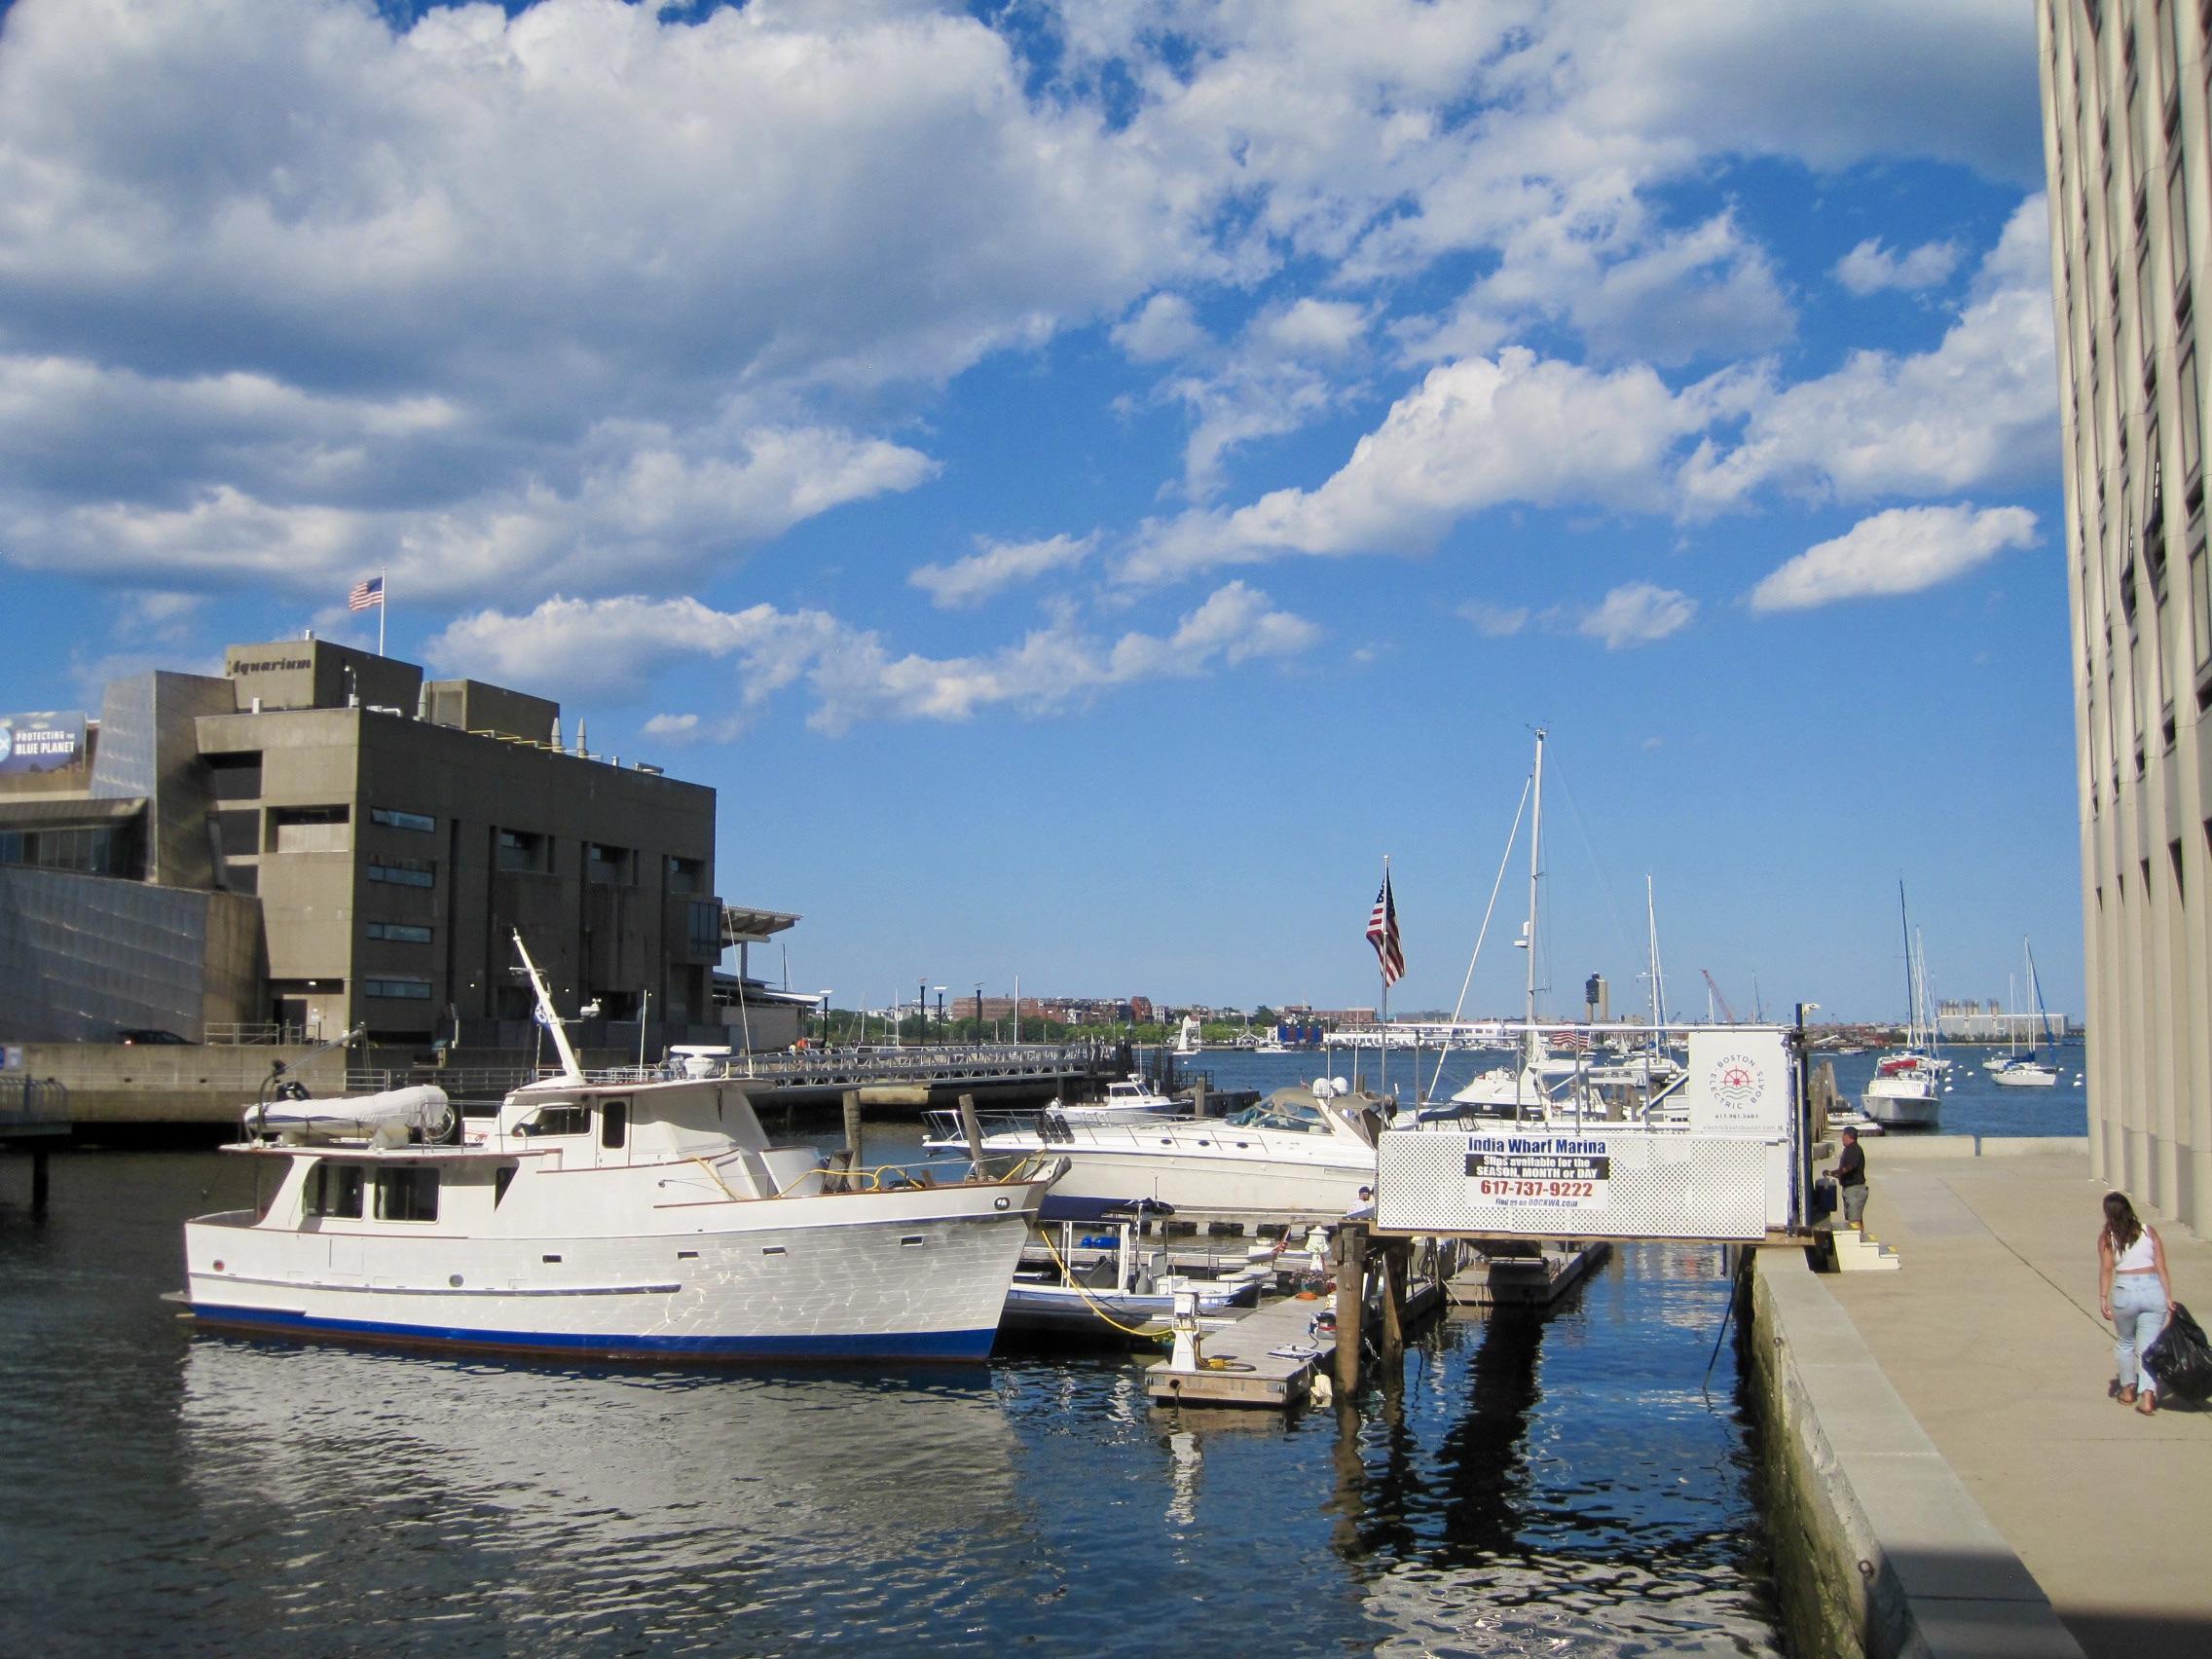 India Wharf near the Harborwalk